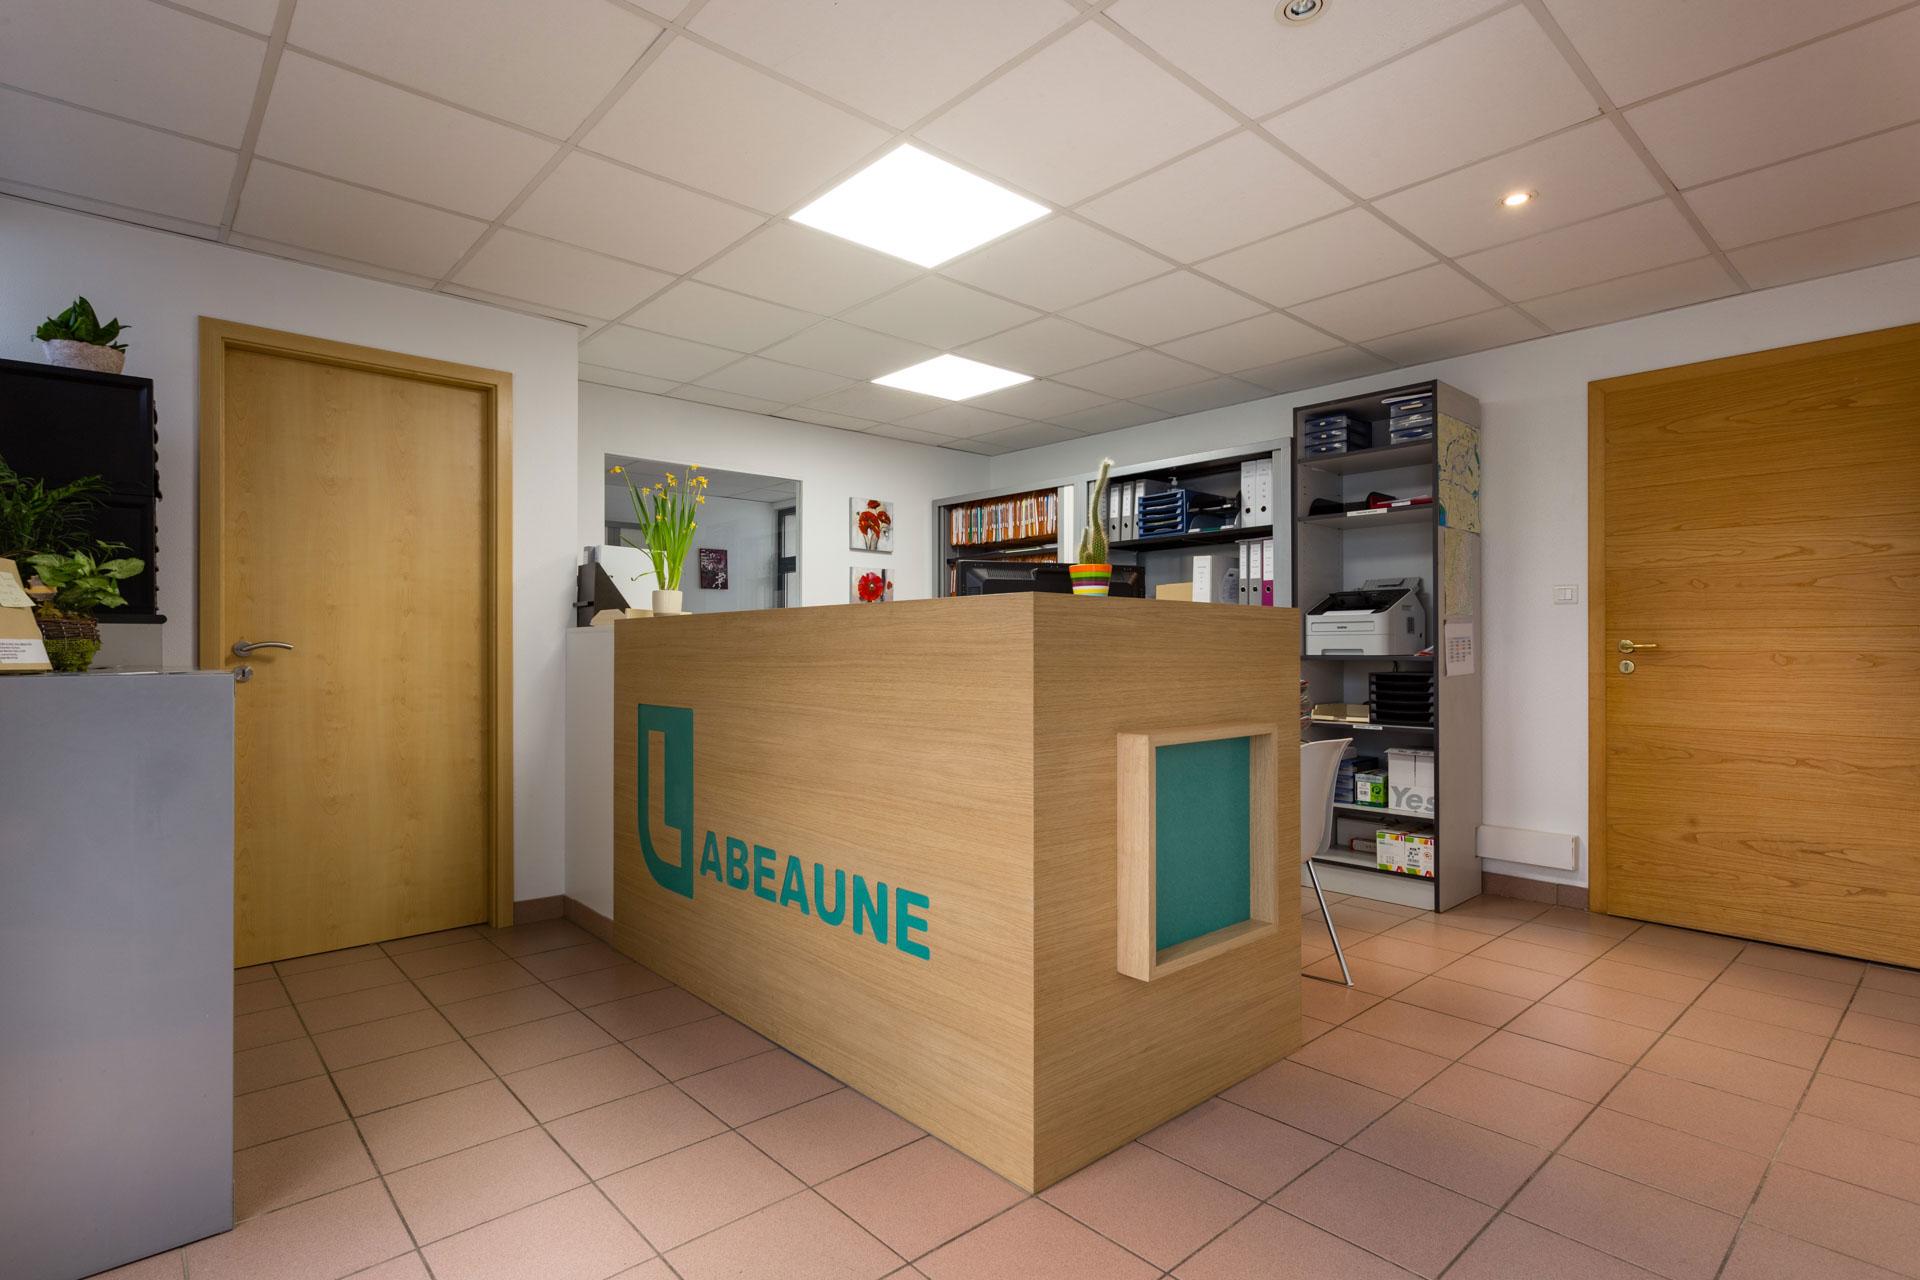 Cabinet radiologie rixheim - Cabinet de radiologie scanner ...